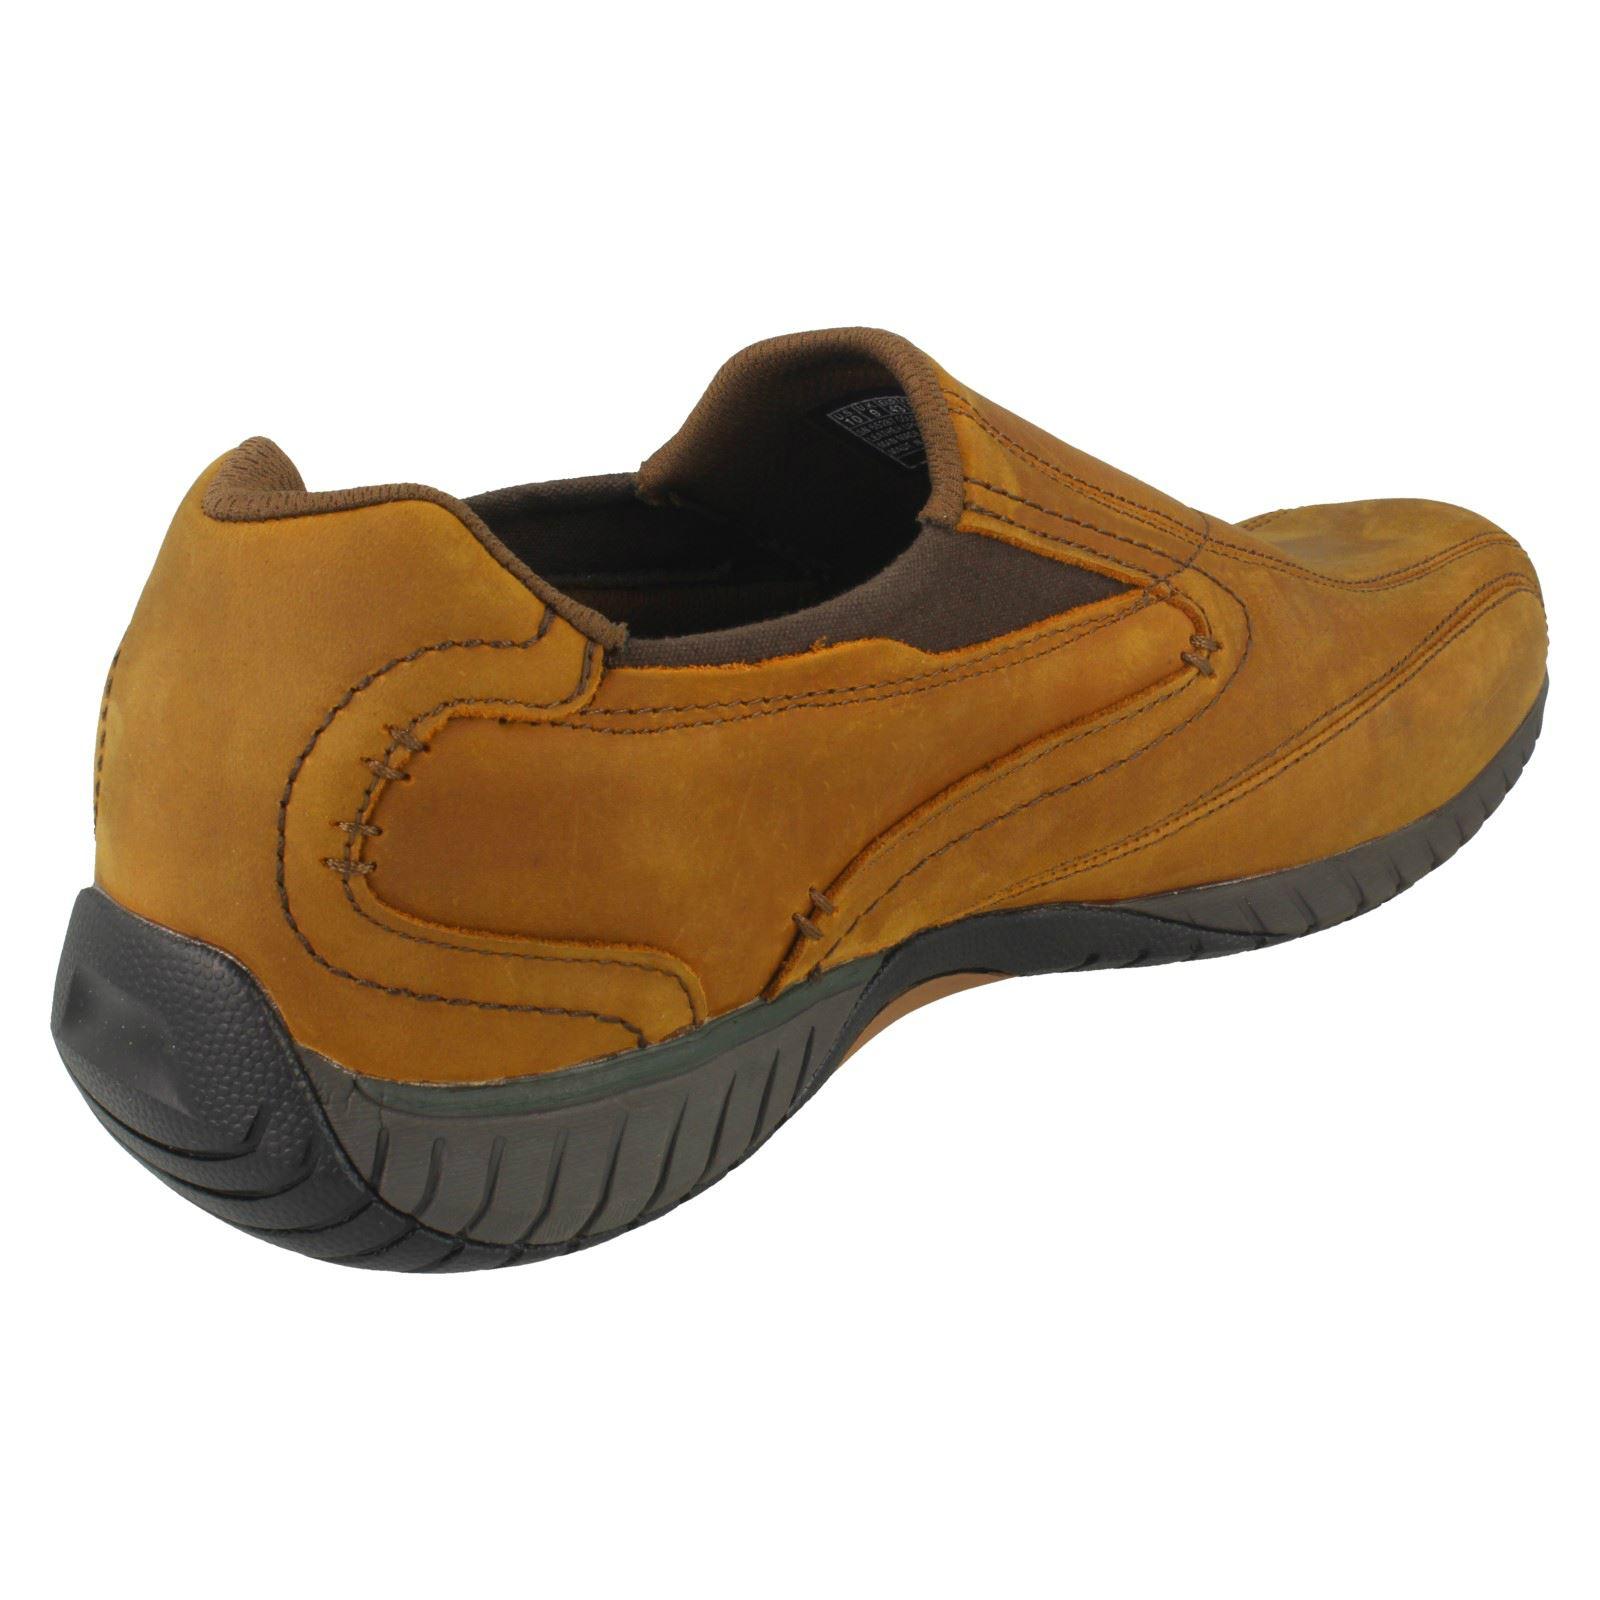 691fd31b71be Mens-Skechers-Casual-Shoes-Sendro-034-Bascom-65287-